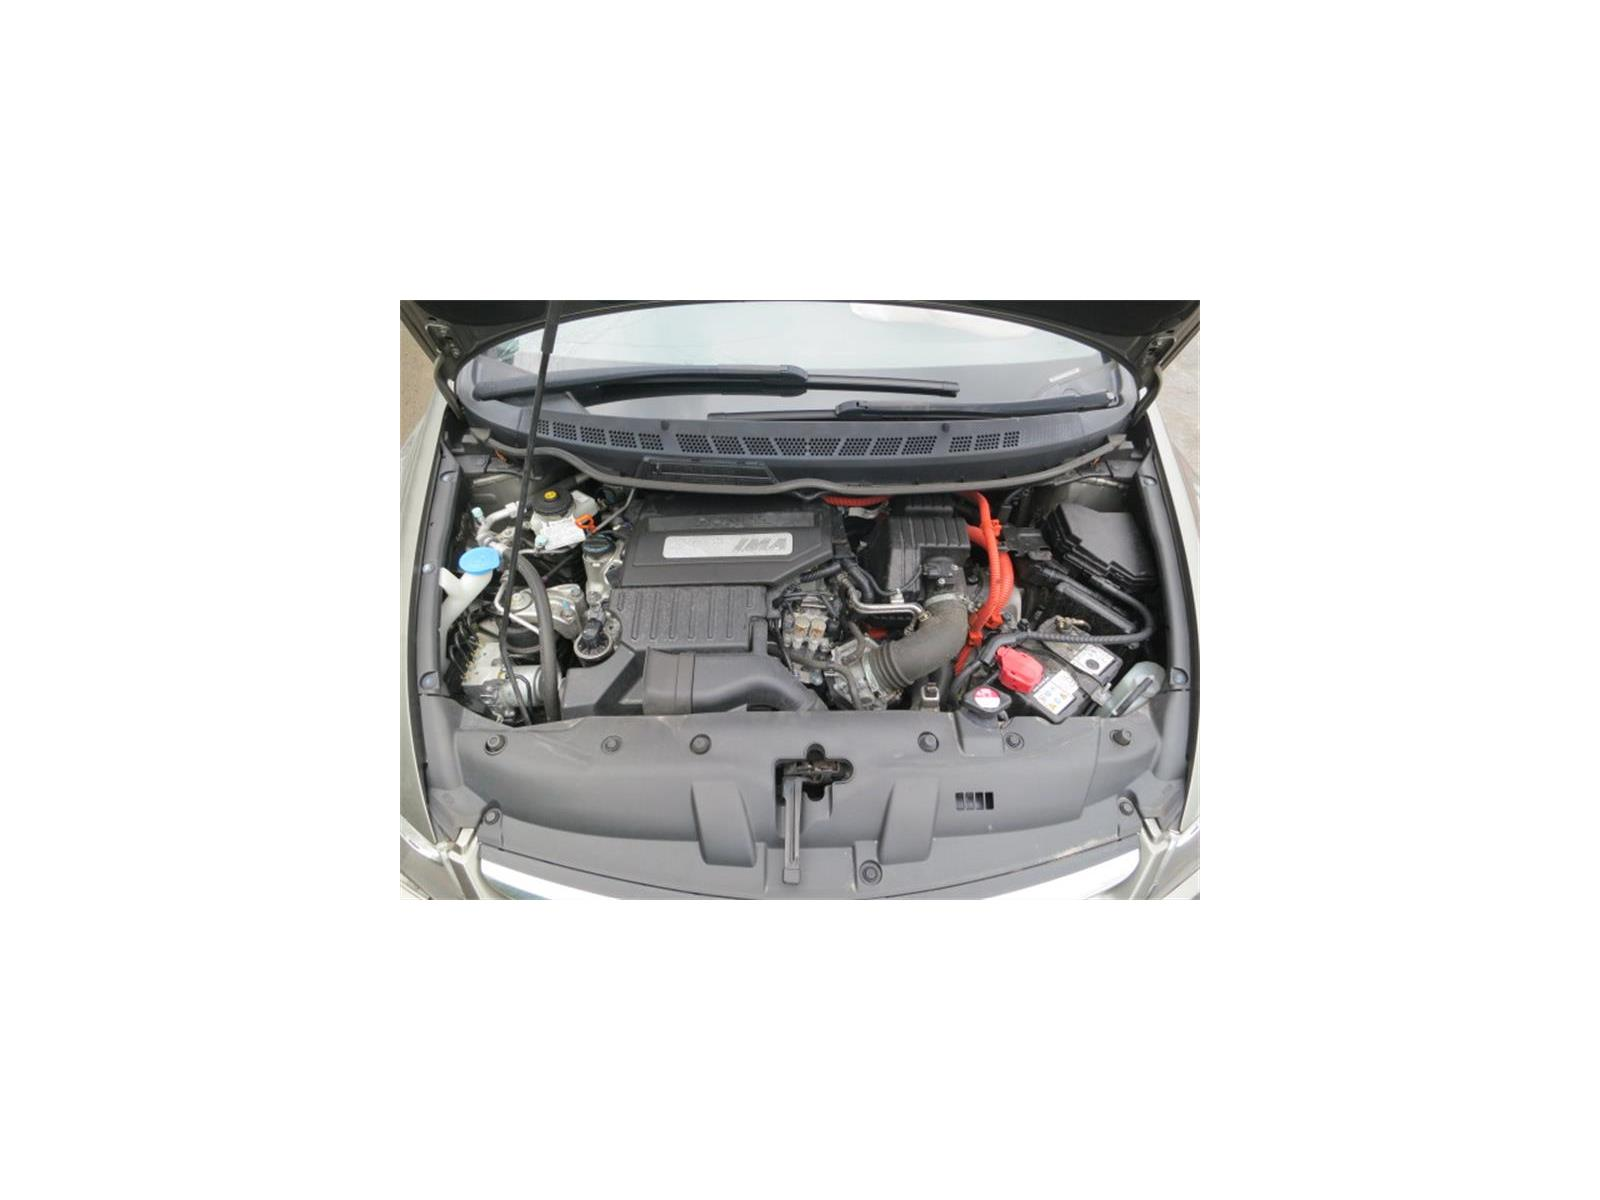 2008 Honda Civic Hybrid 2006 To 4 Door Saloon Petrol Electric Engine